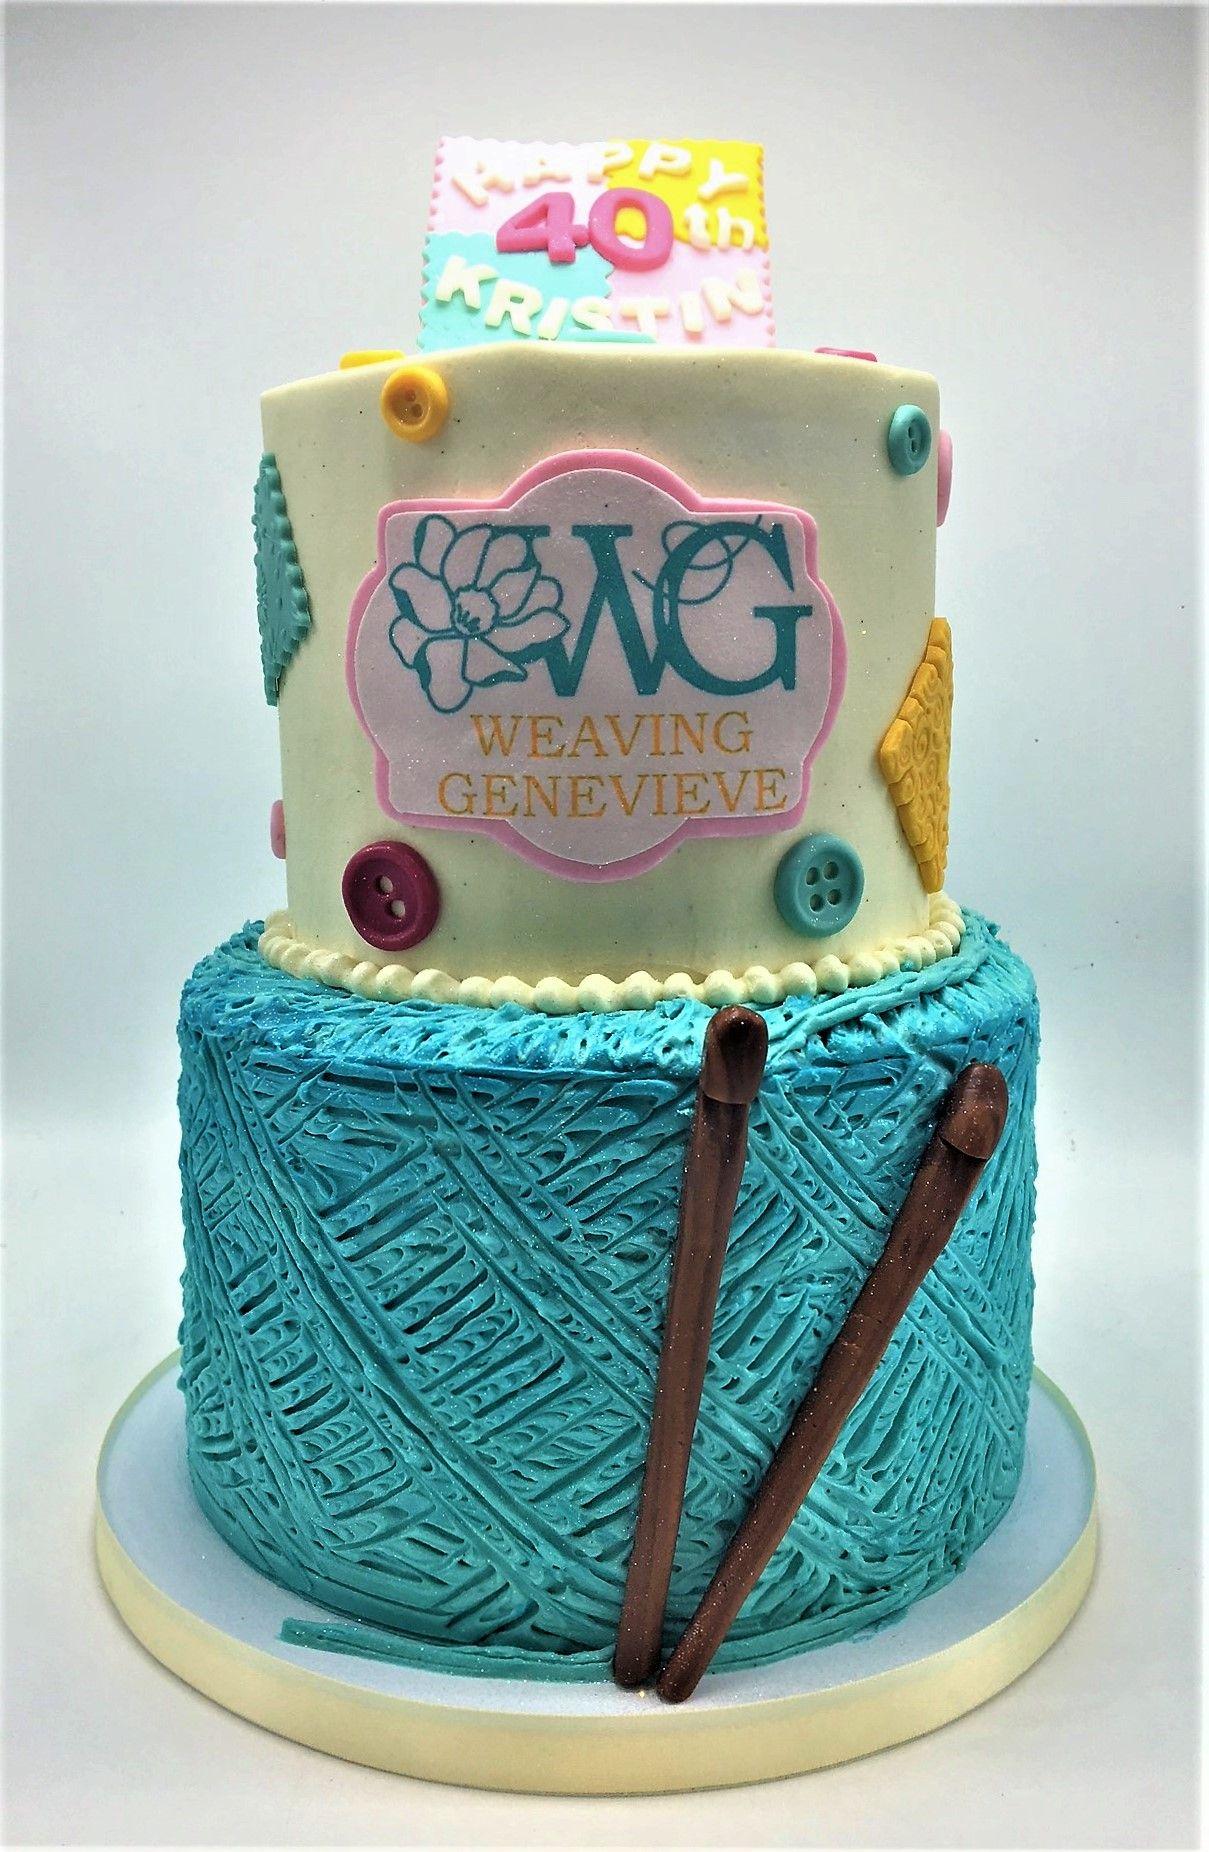 2 Tier Crochet Knitting Yarn Themed 40th Birthday Cake By Flavor